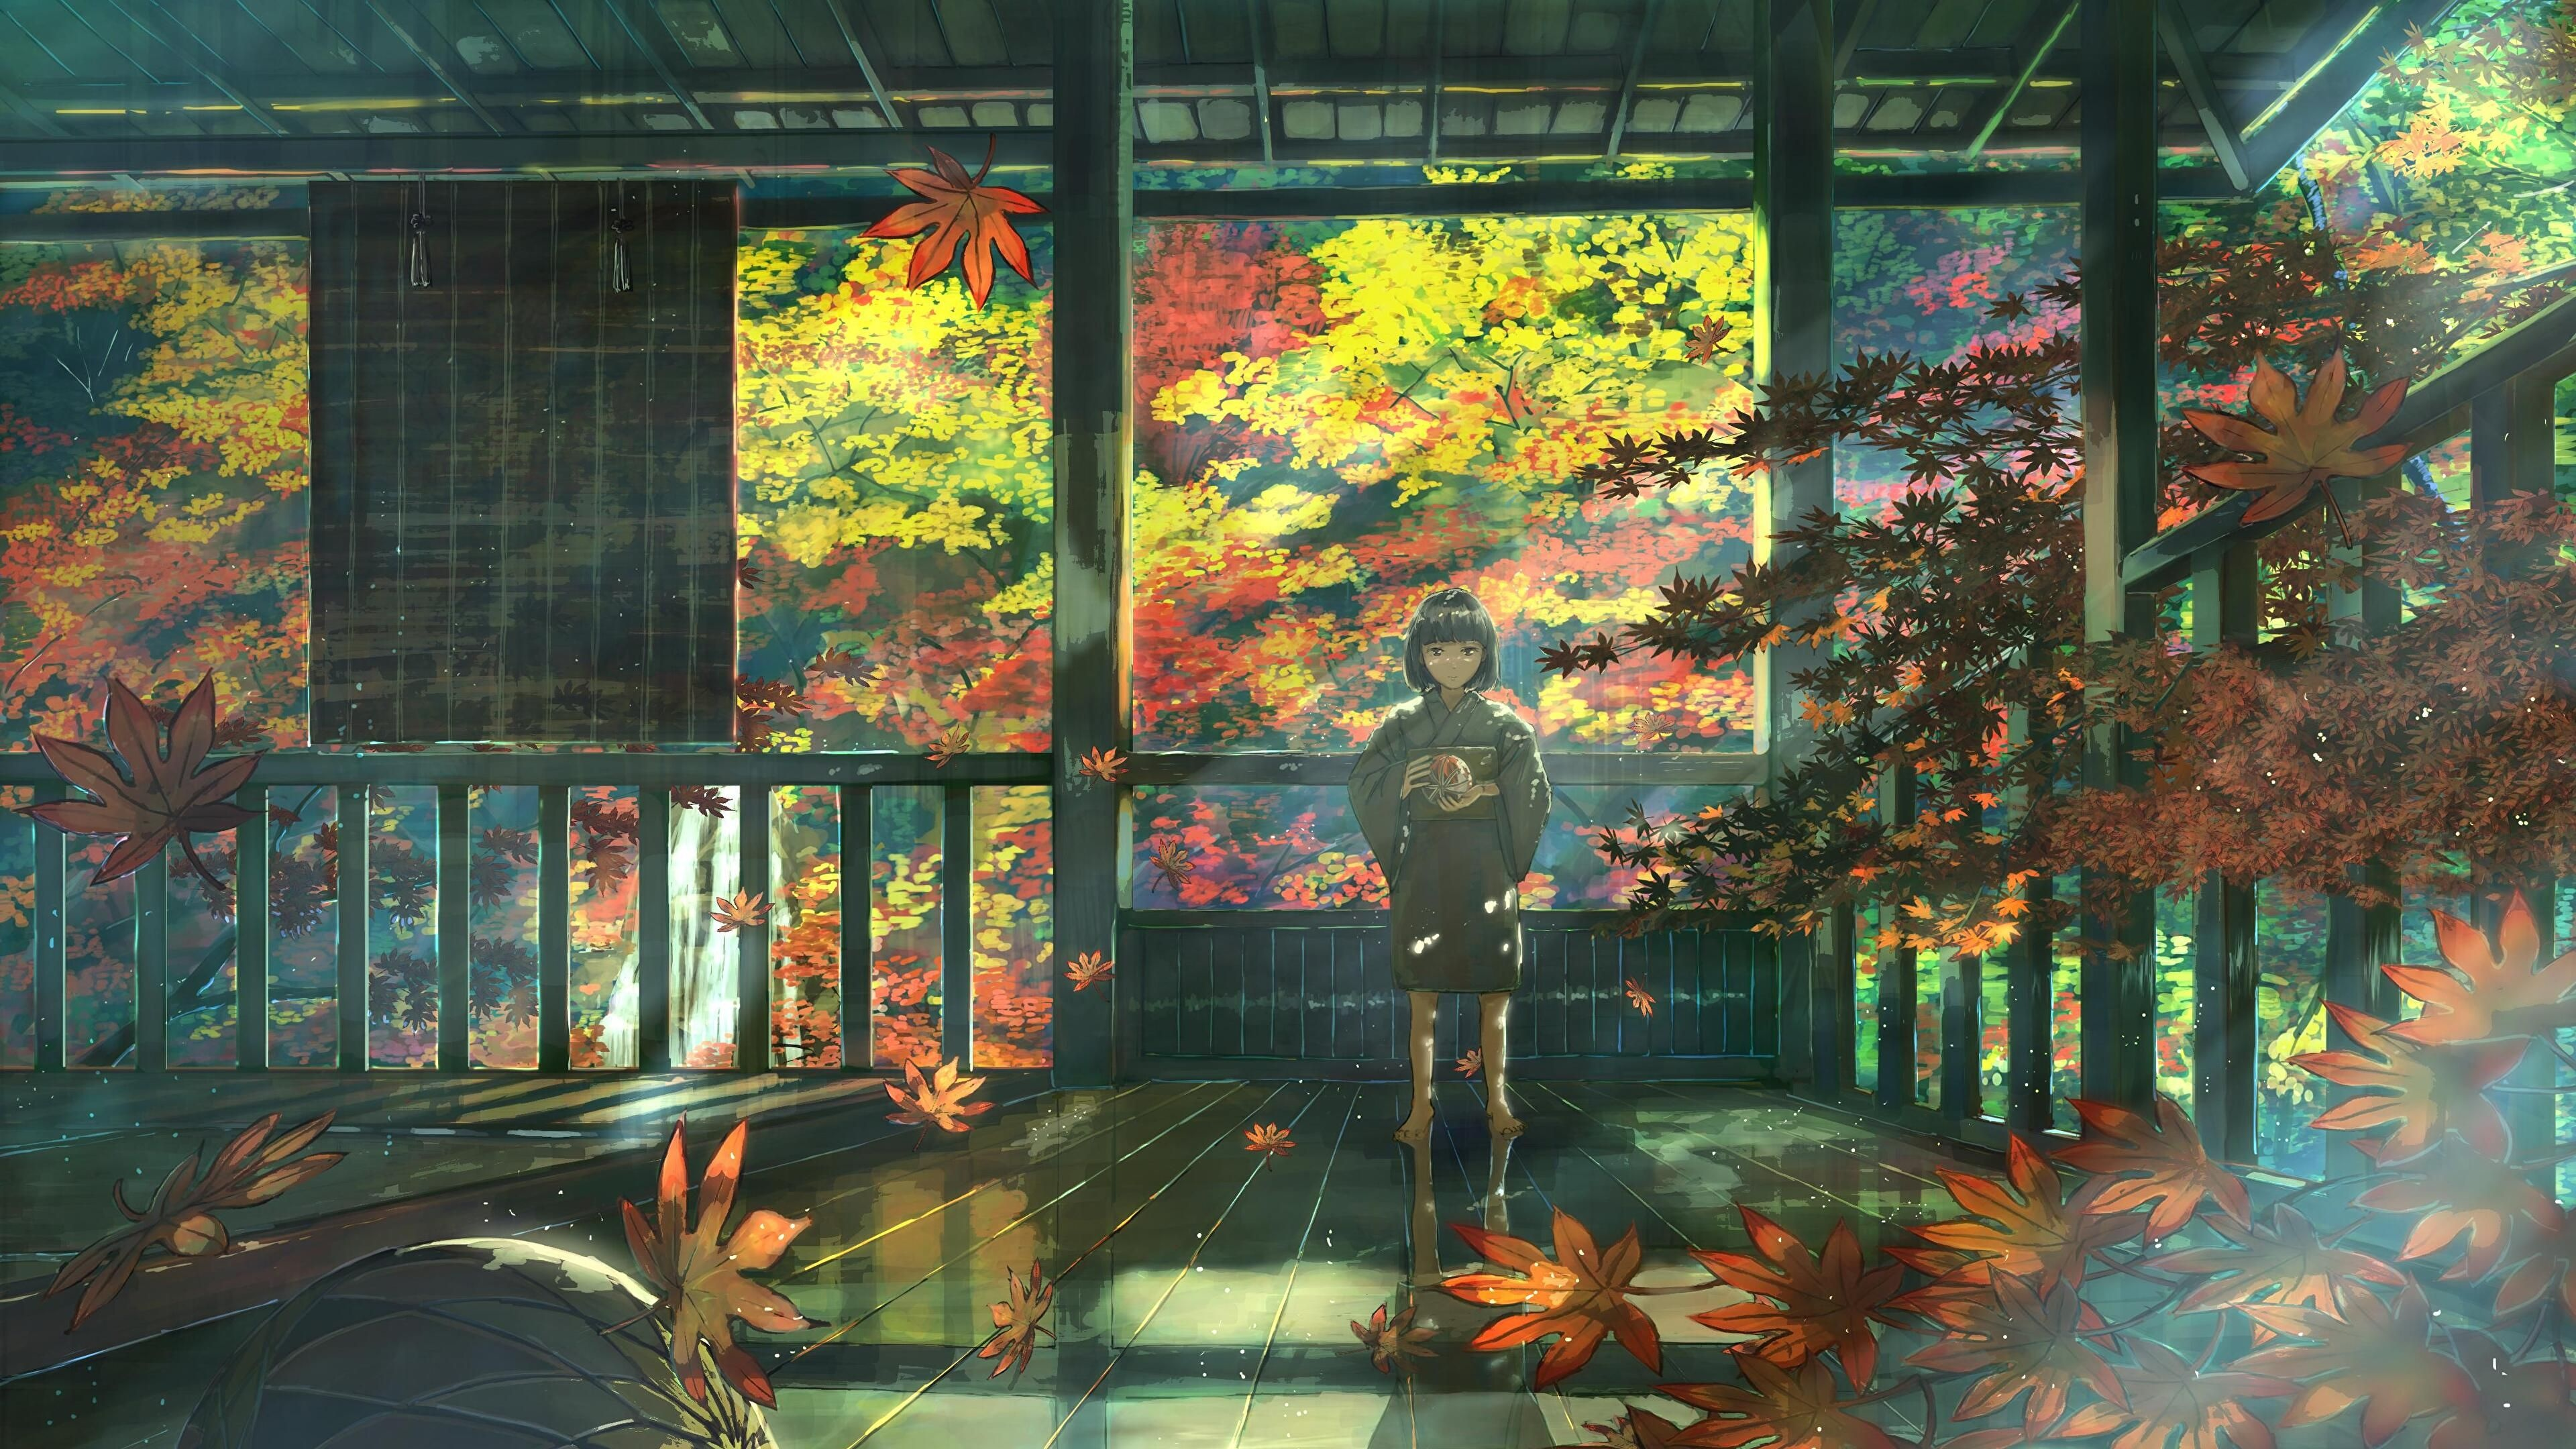 Fall Art hd background